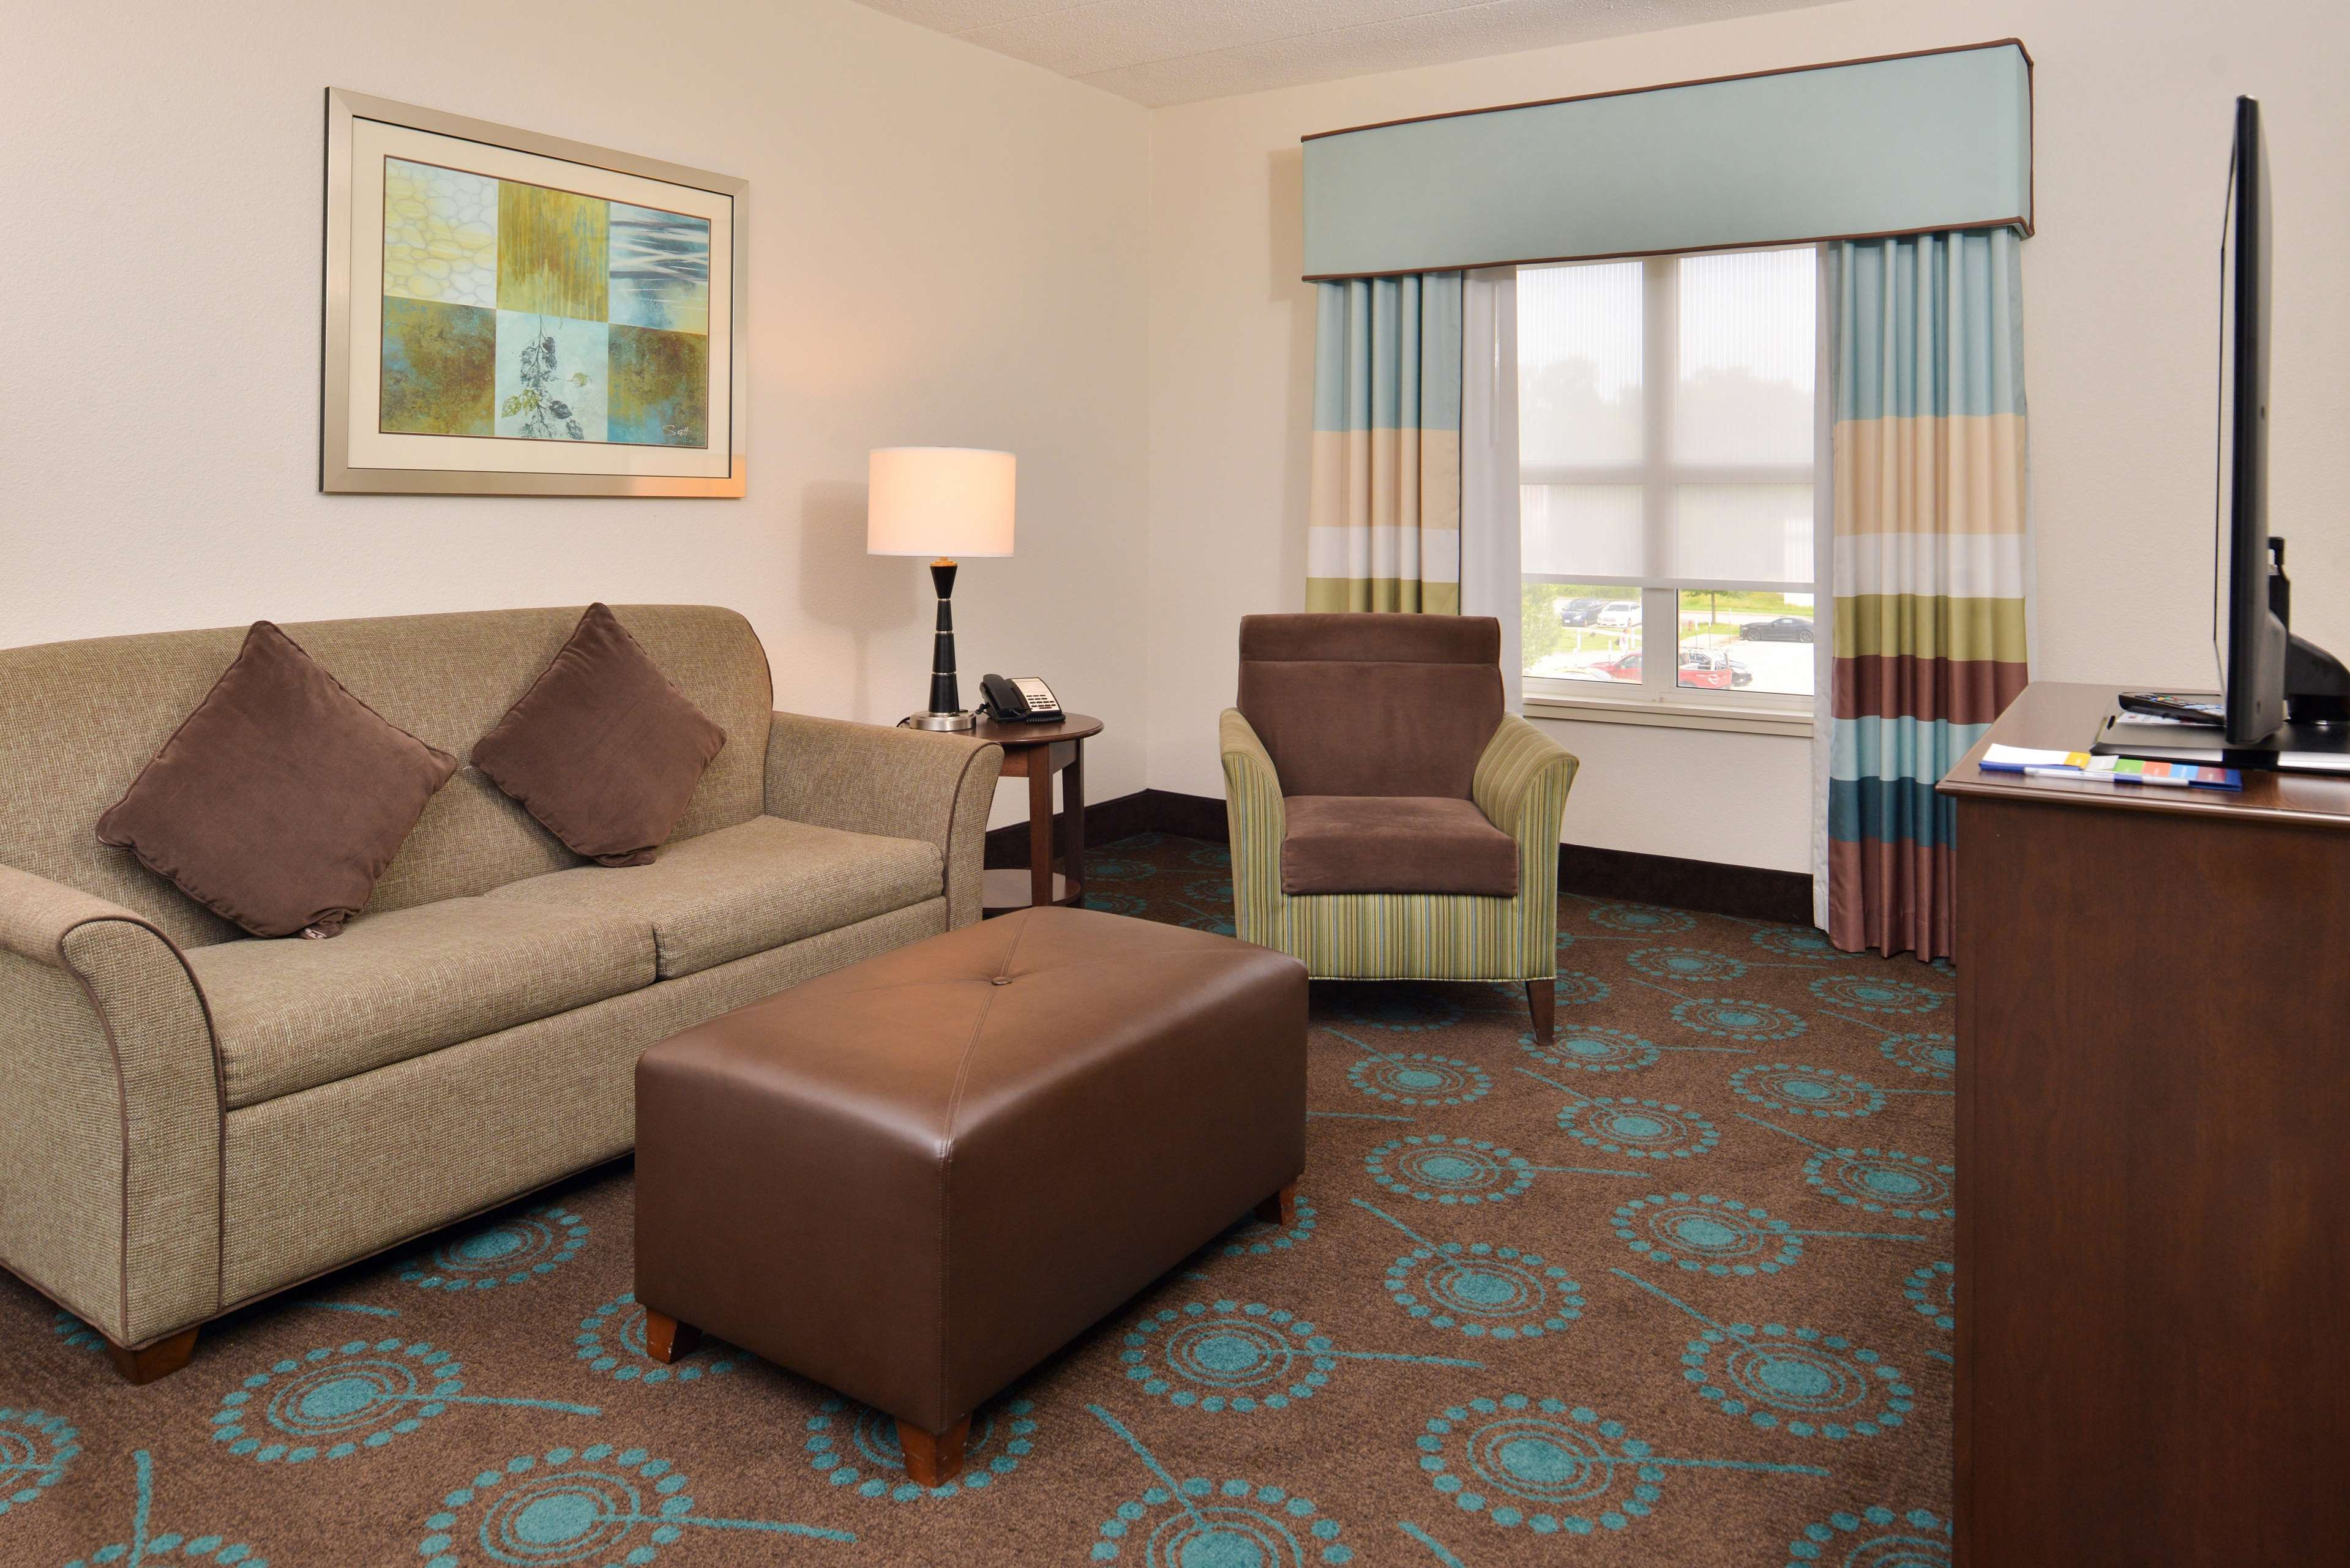 Hampton Inn & Suites Newport News (Oyster Point) image 23